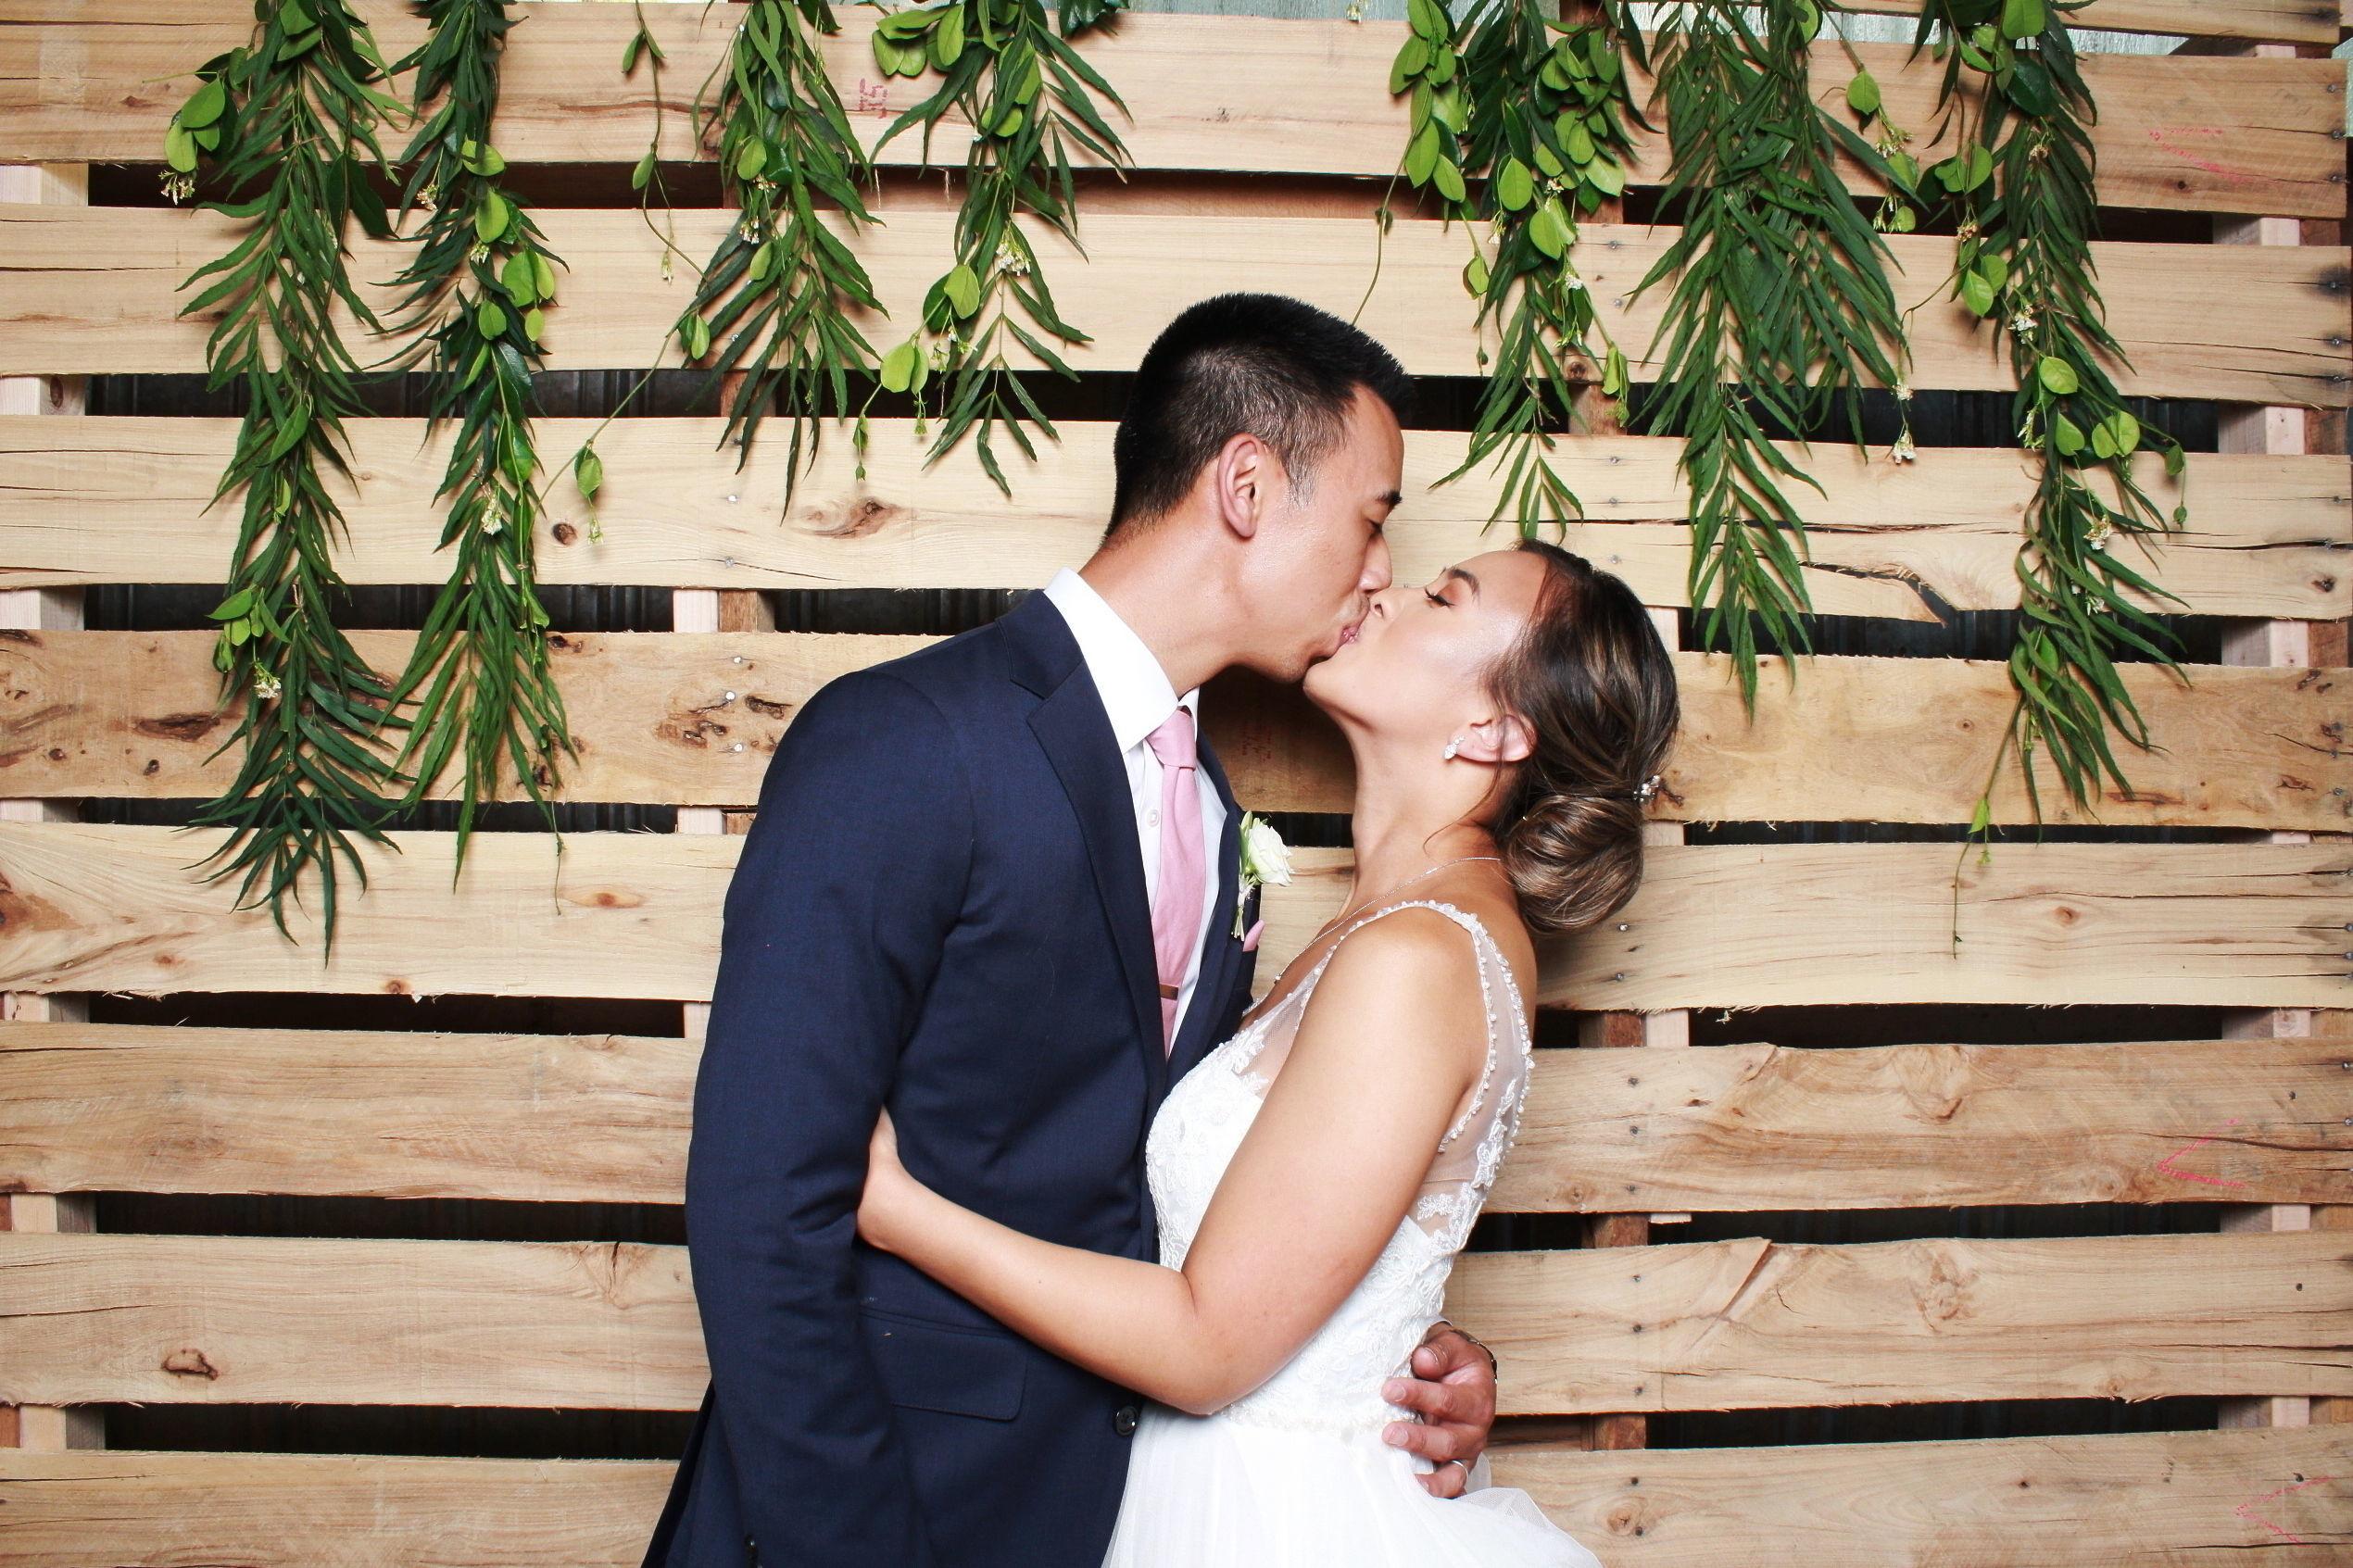 Boho wedding photo booth